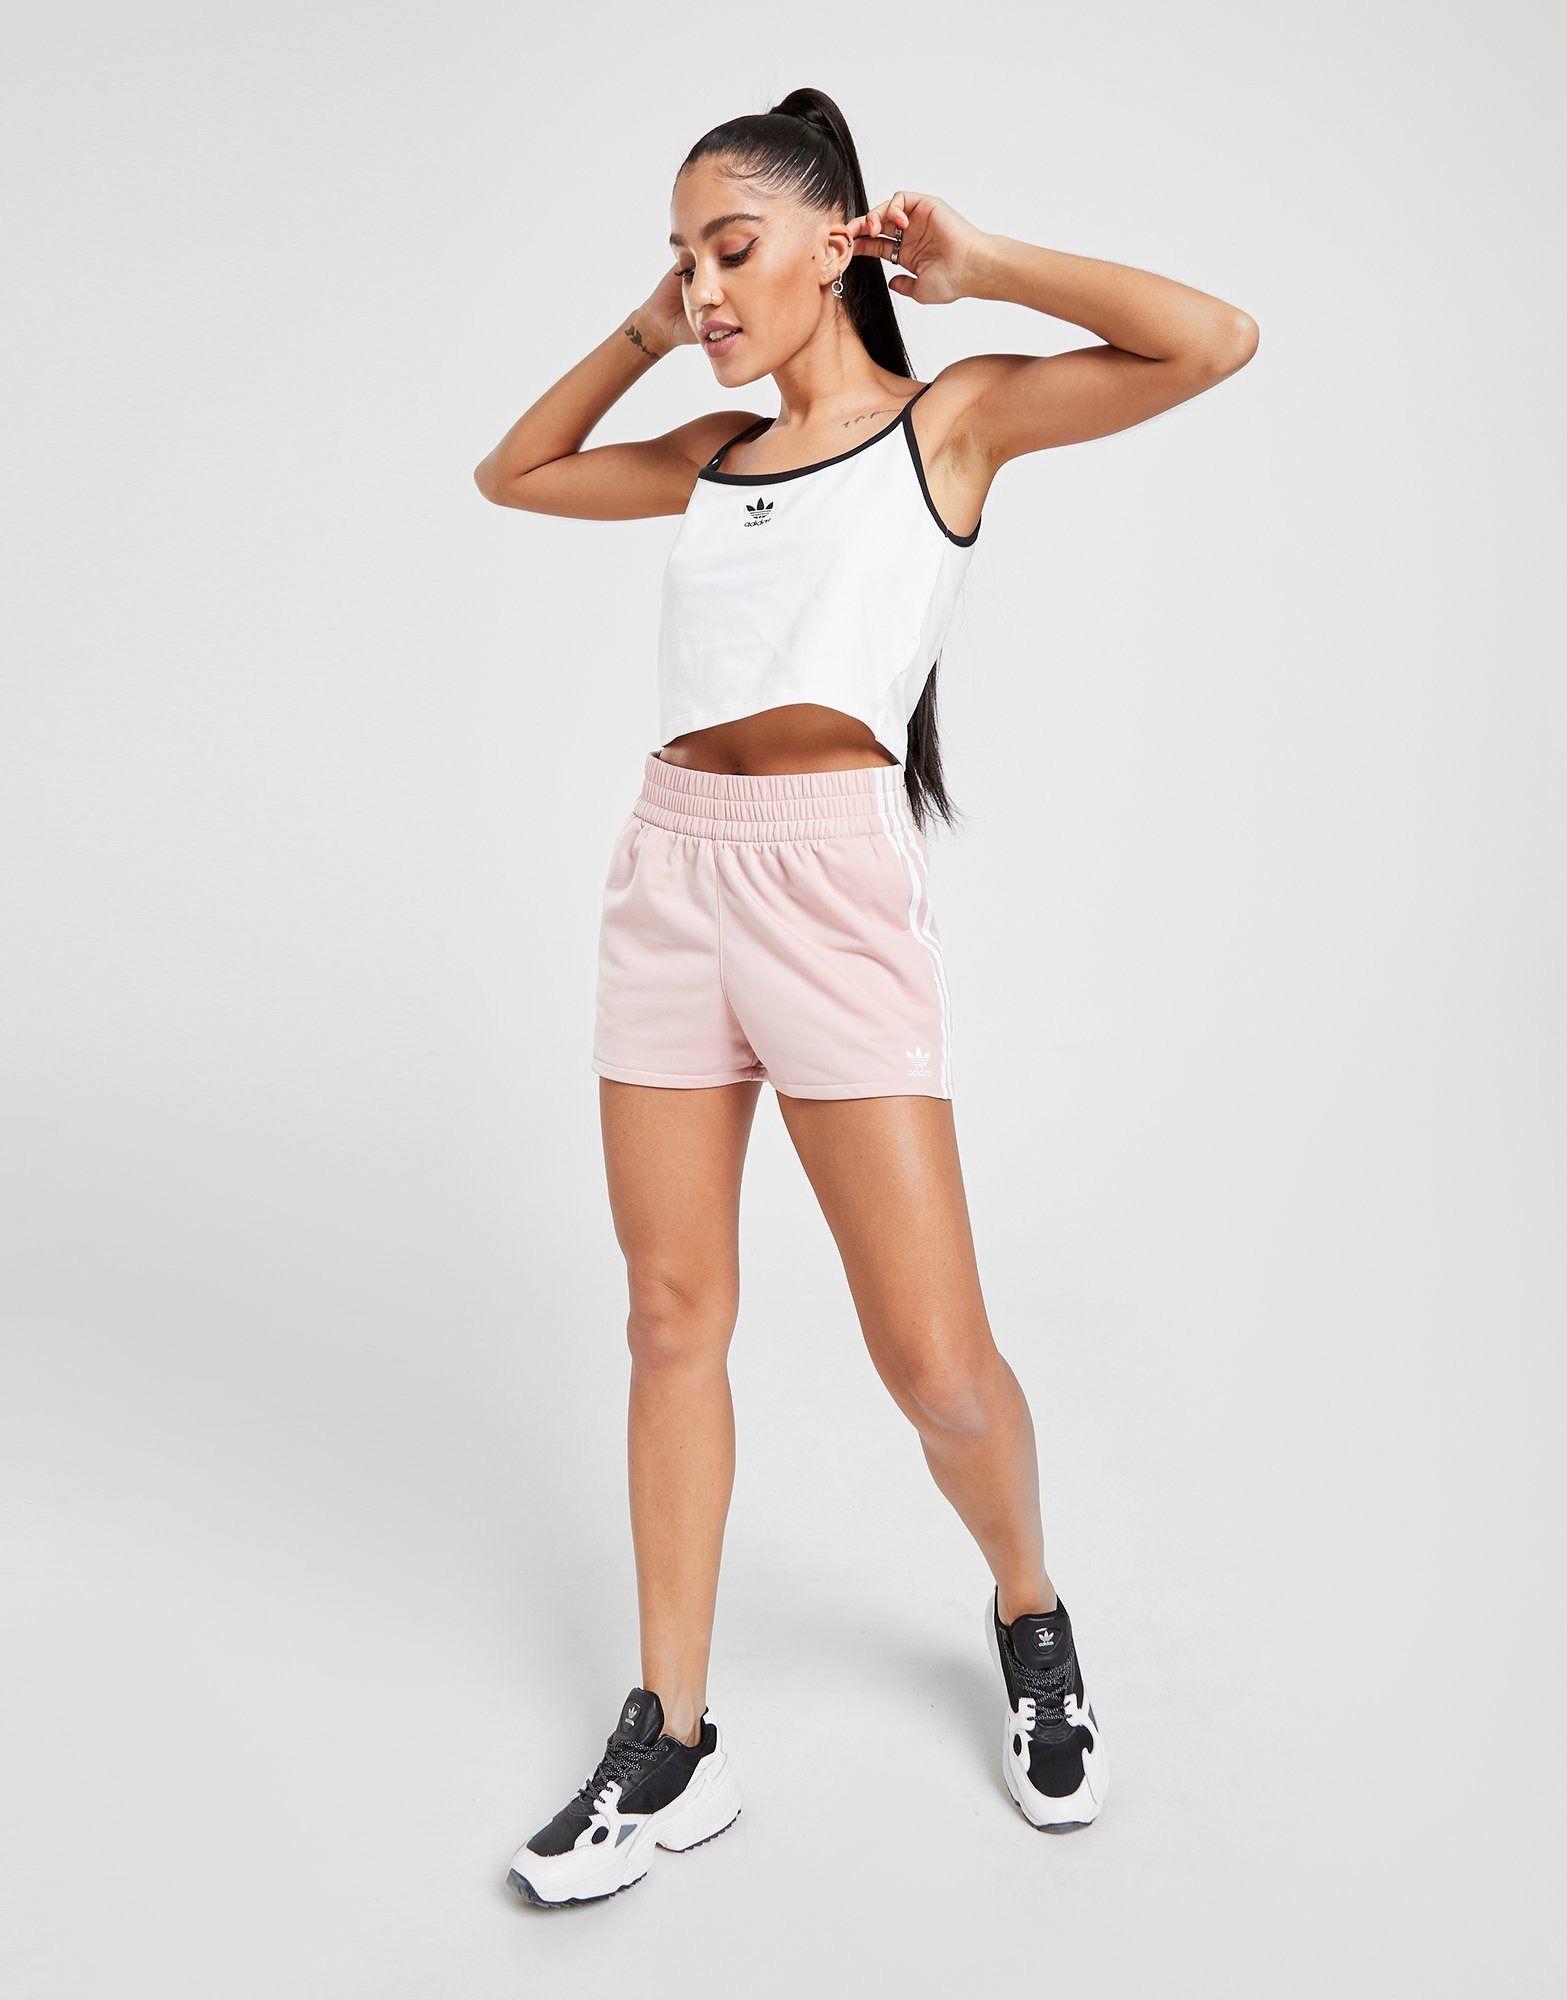 buy pink adidas originals 3 stripes poly shorts jd sports in 2020 pink adidas jd sports adidas originals pinterest